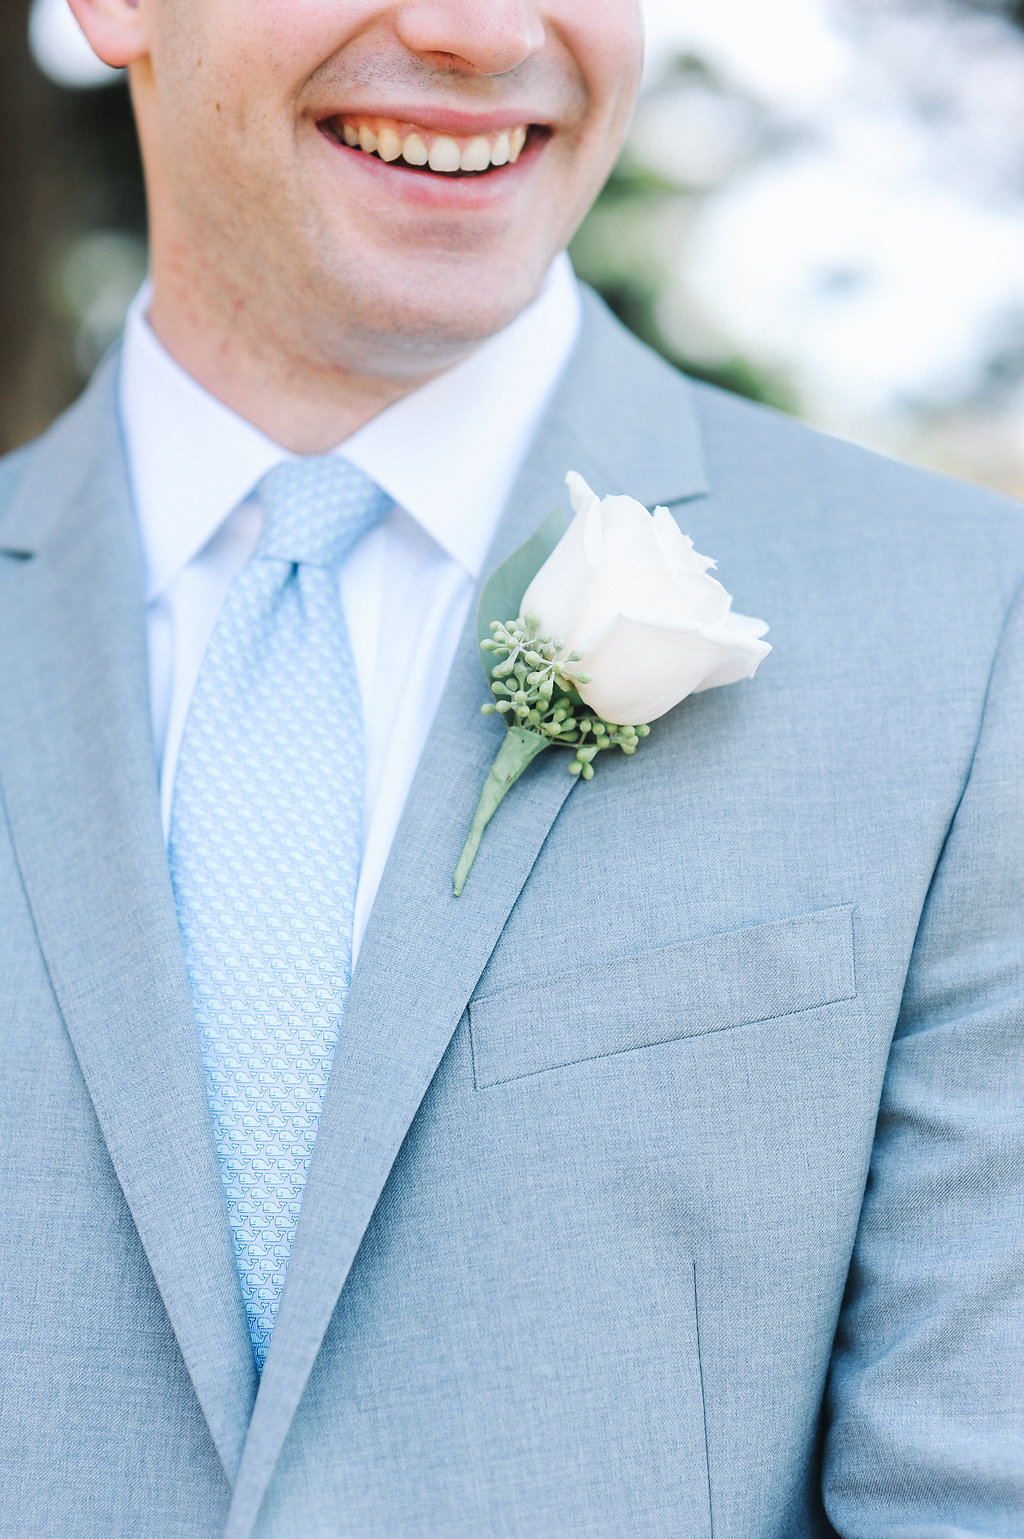 BrideGroomPortraits_Dragonline_Studios_Jamestown_RI_Wedding-59.jpg